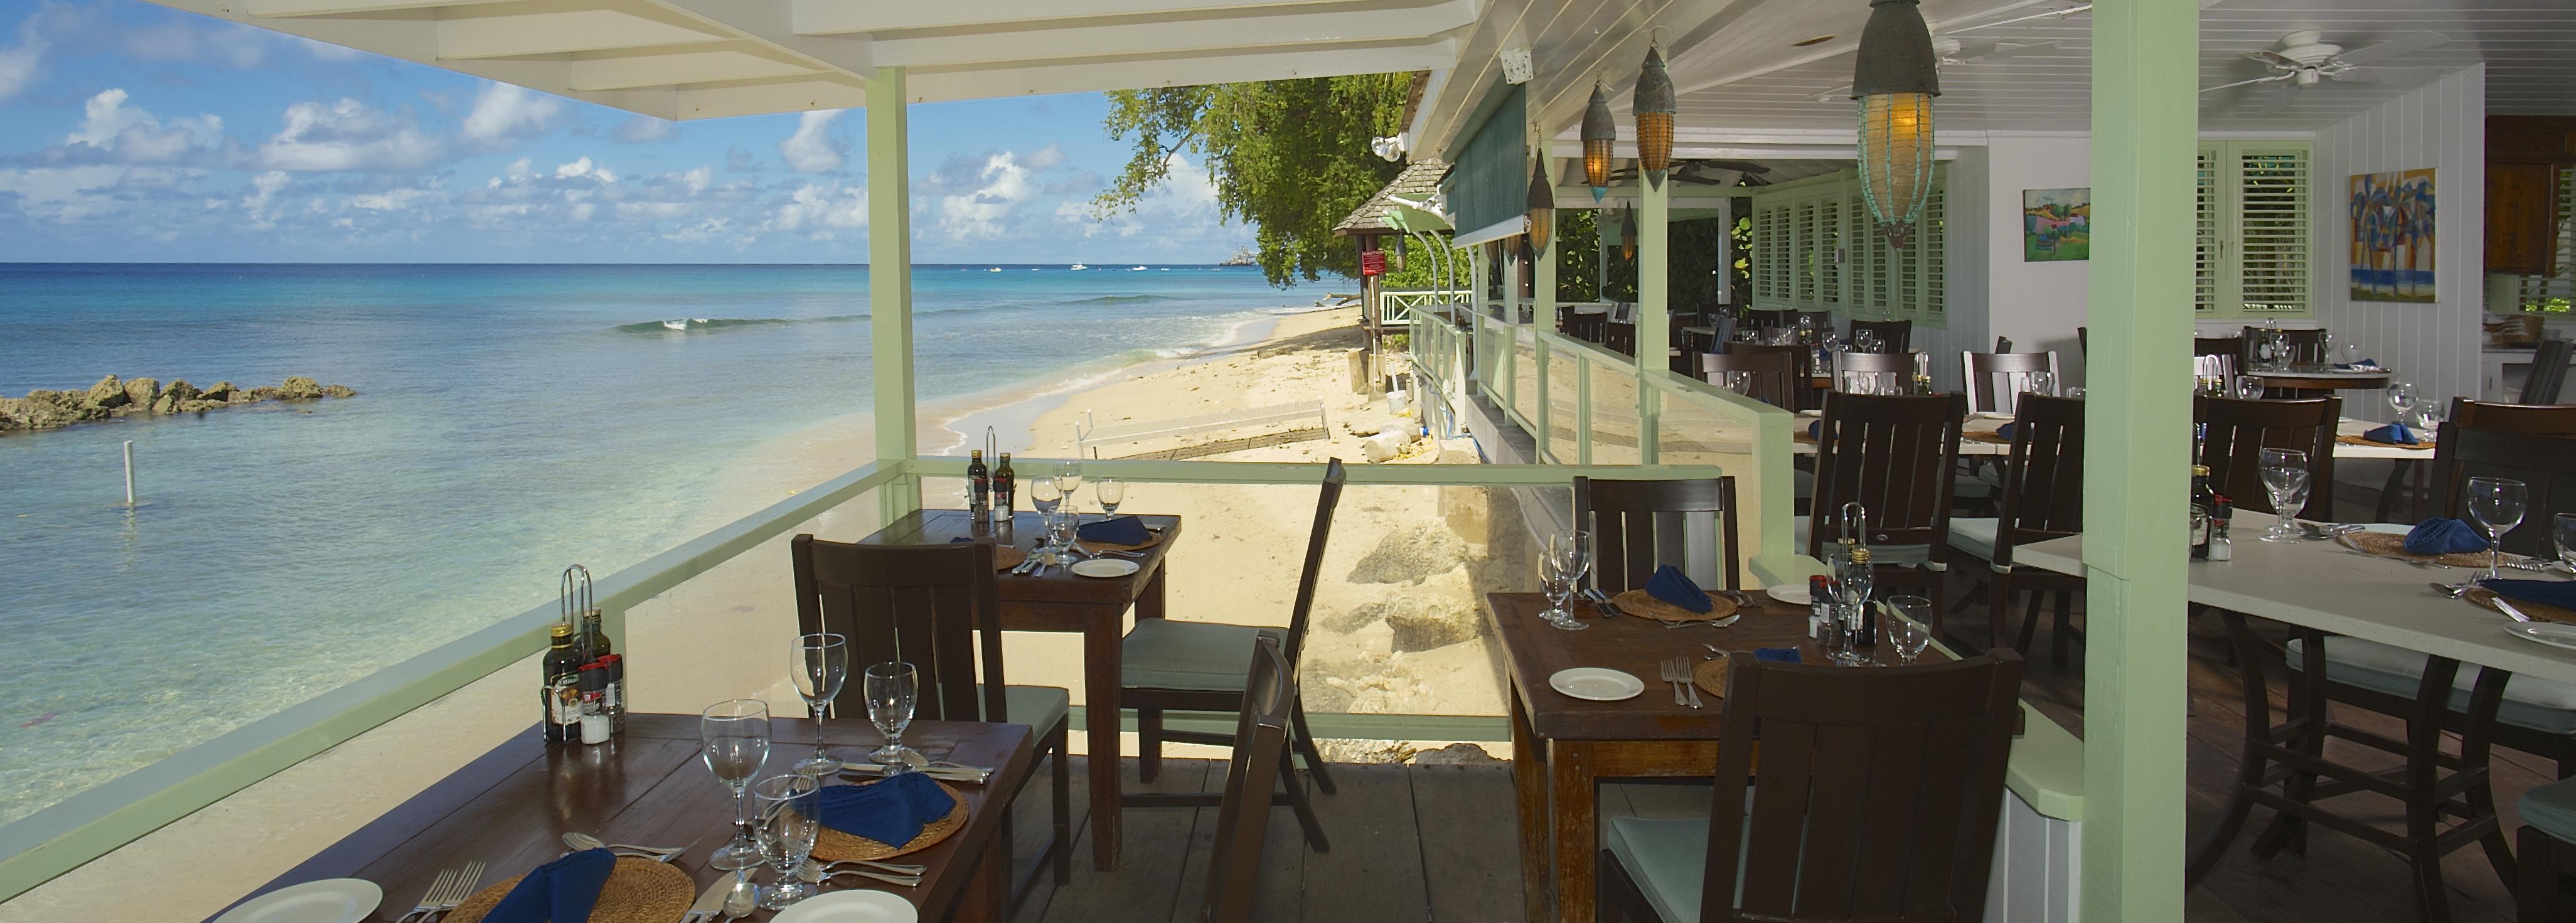 little-good-harbour-dining-terrace